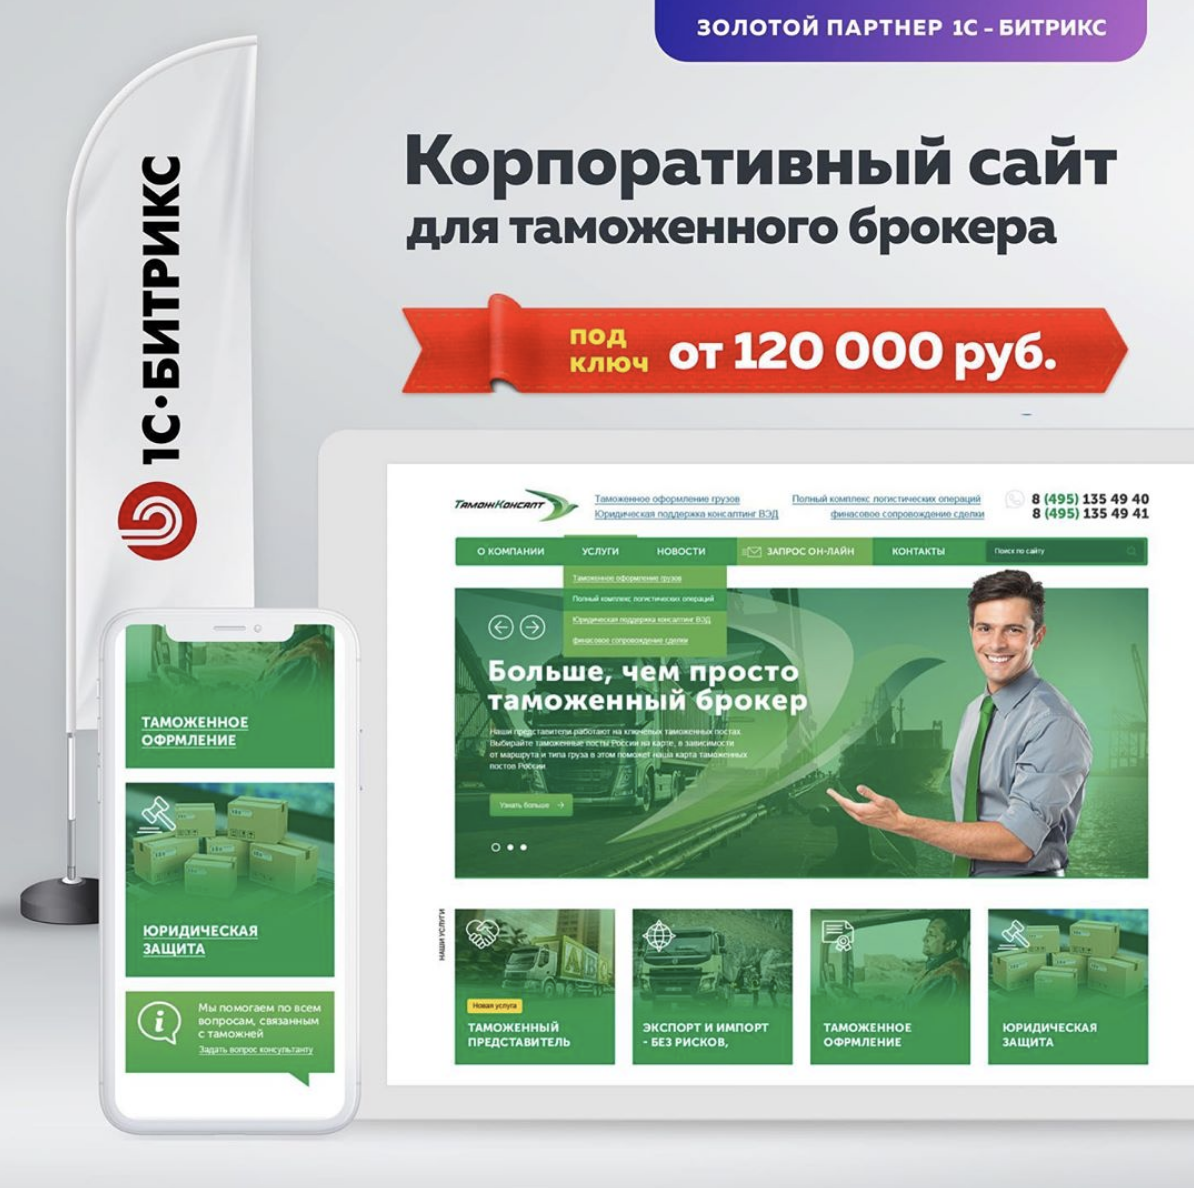 Корпоративный сайт для таможенного брокера под ключ за 1 месяц. От: 120' 000 руб